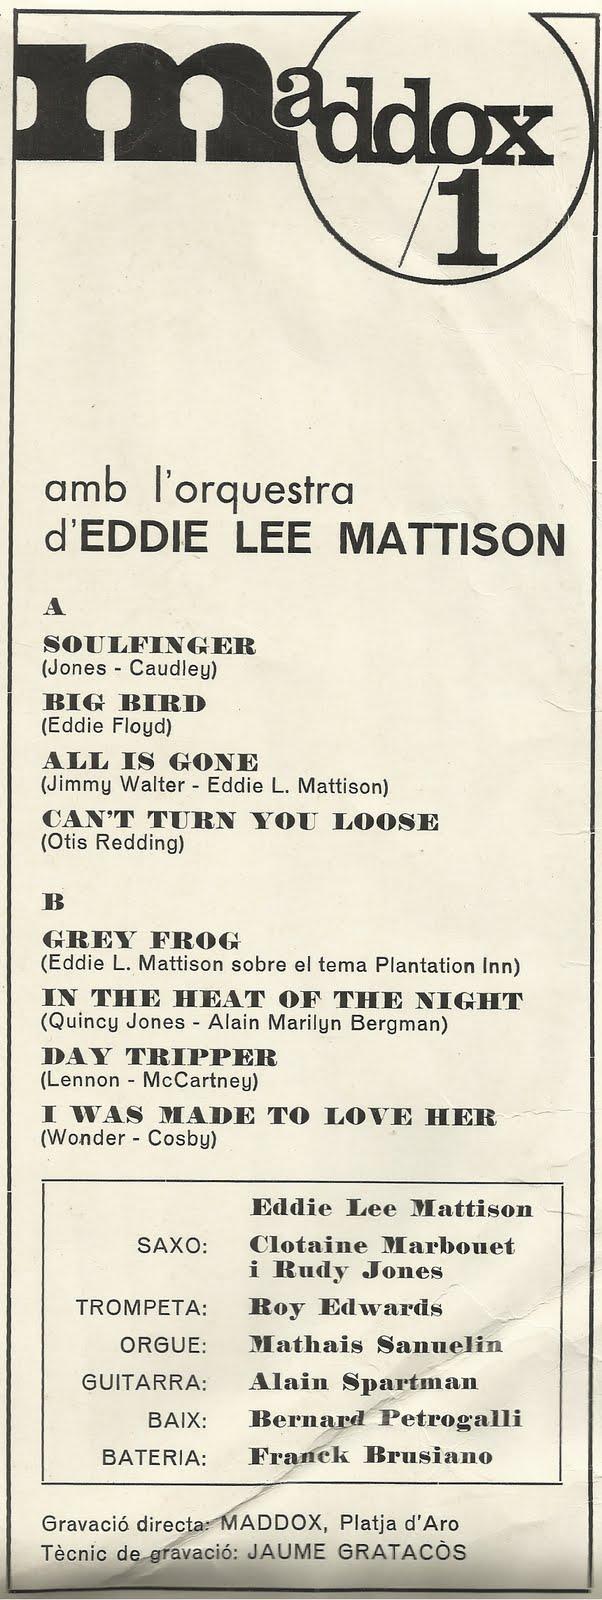 Eddie Lee Mattison A La Costa Brava